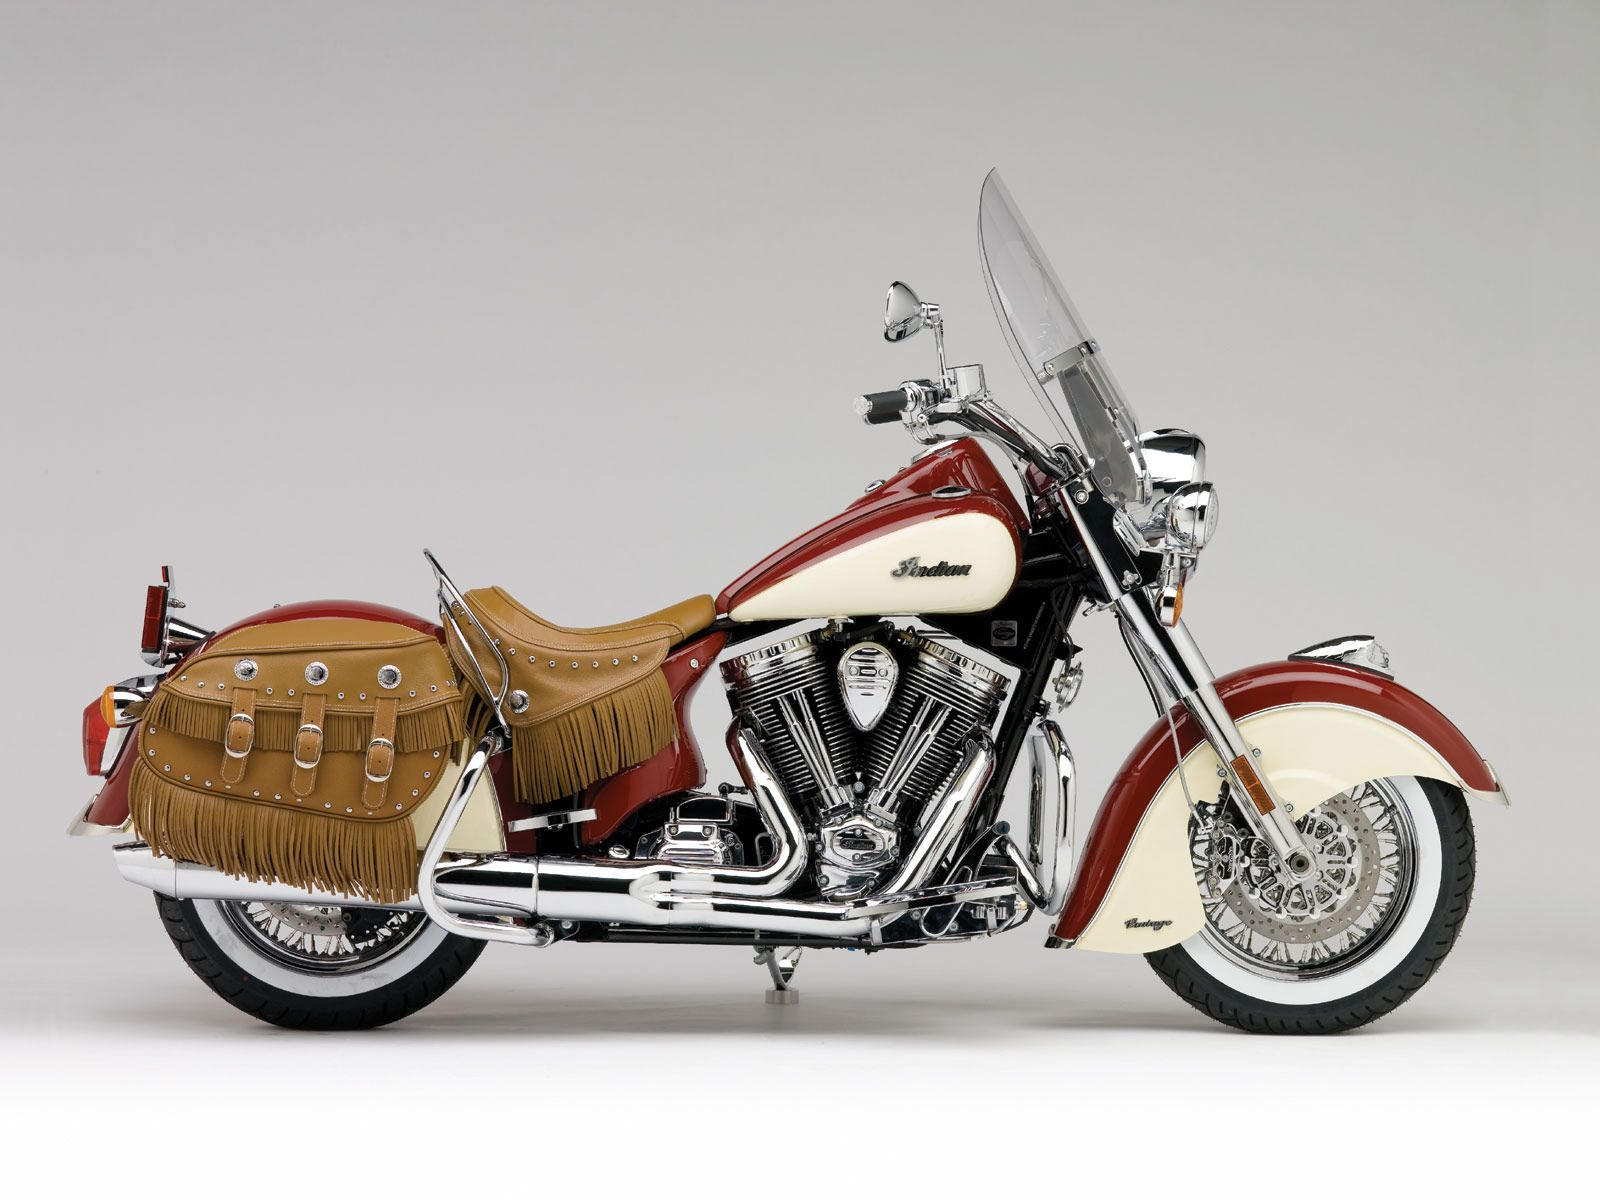 Venturousbikers Com Indian Motorcycle Vintage Indian Motorcycles Old Motorcycles [ 1200 x 1600 Pixel ]